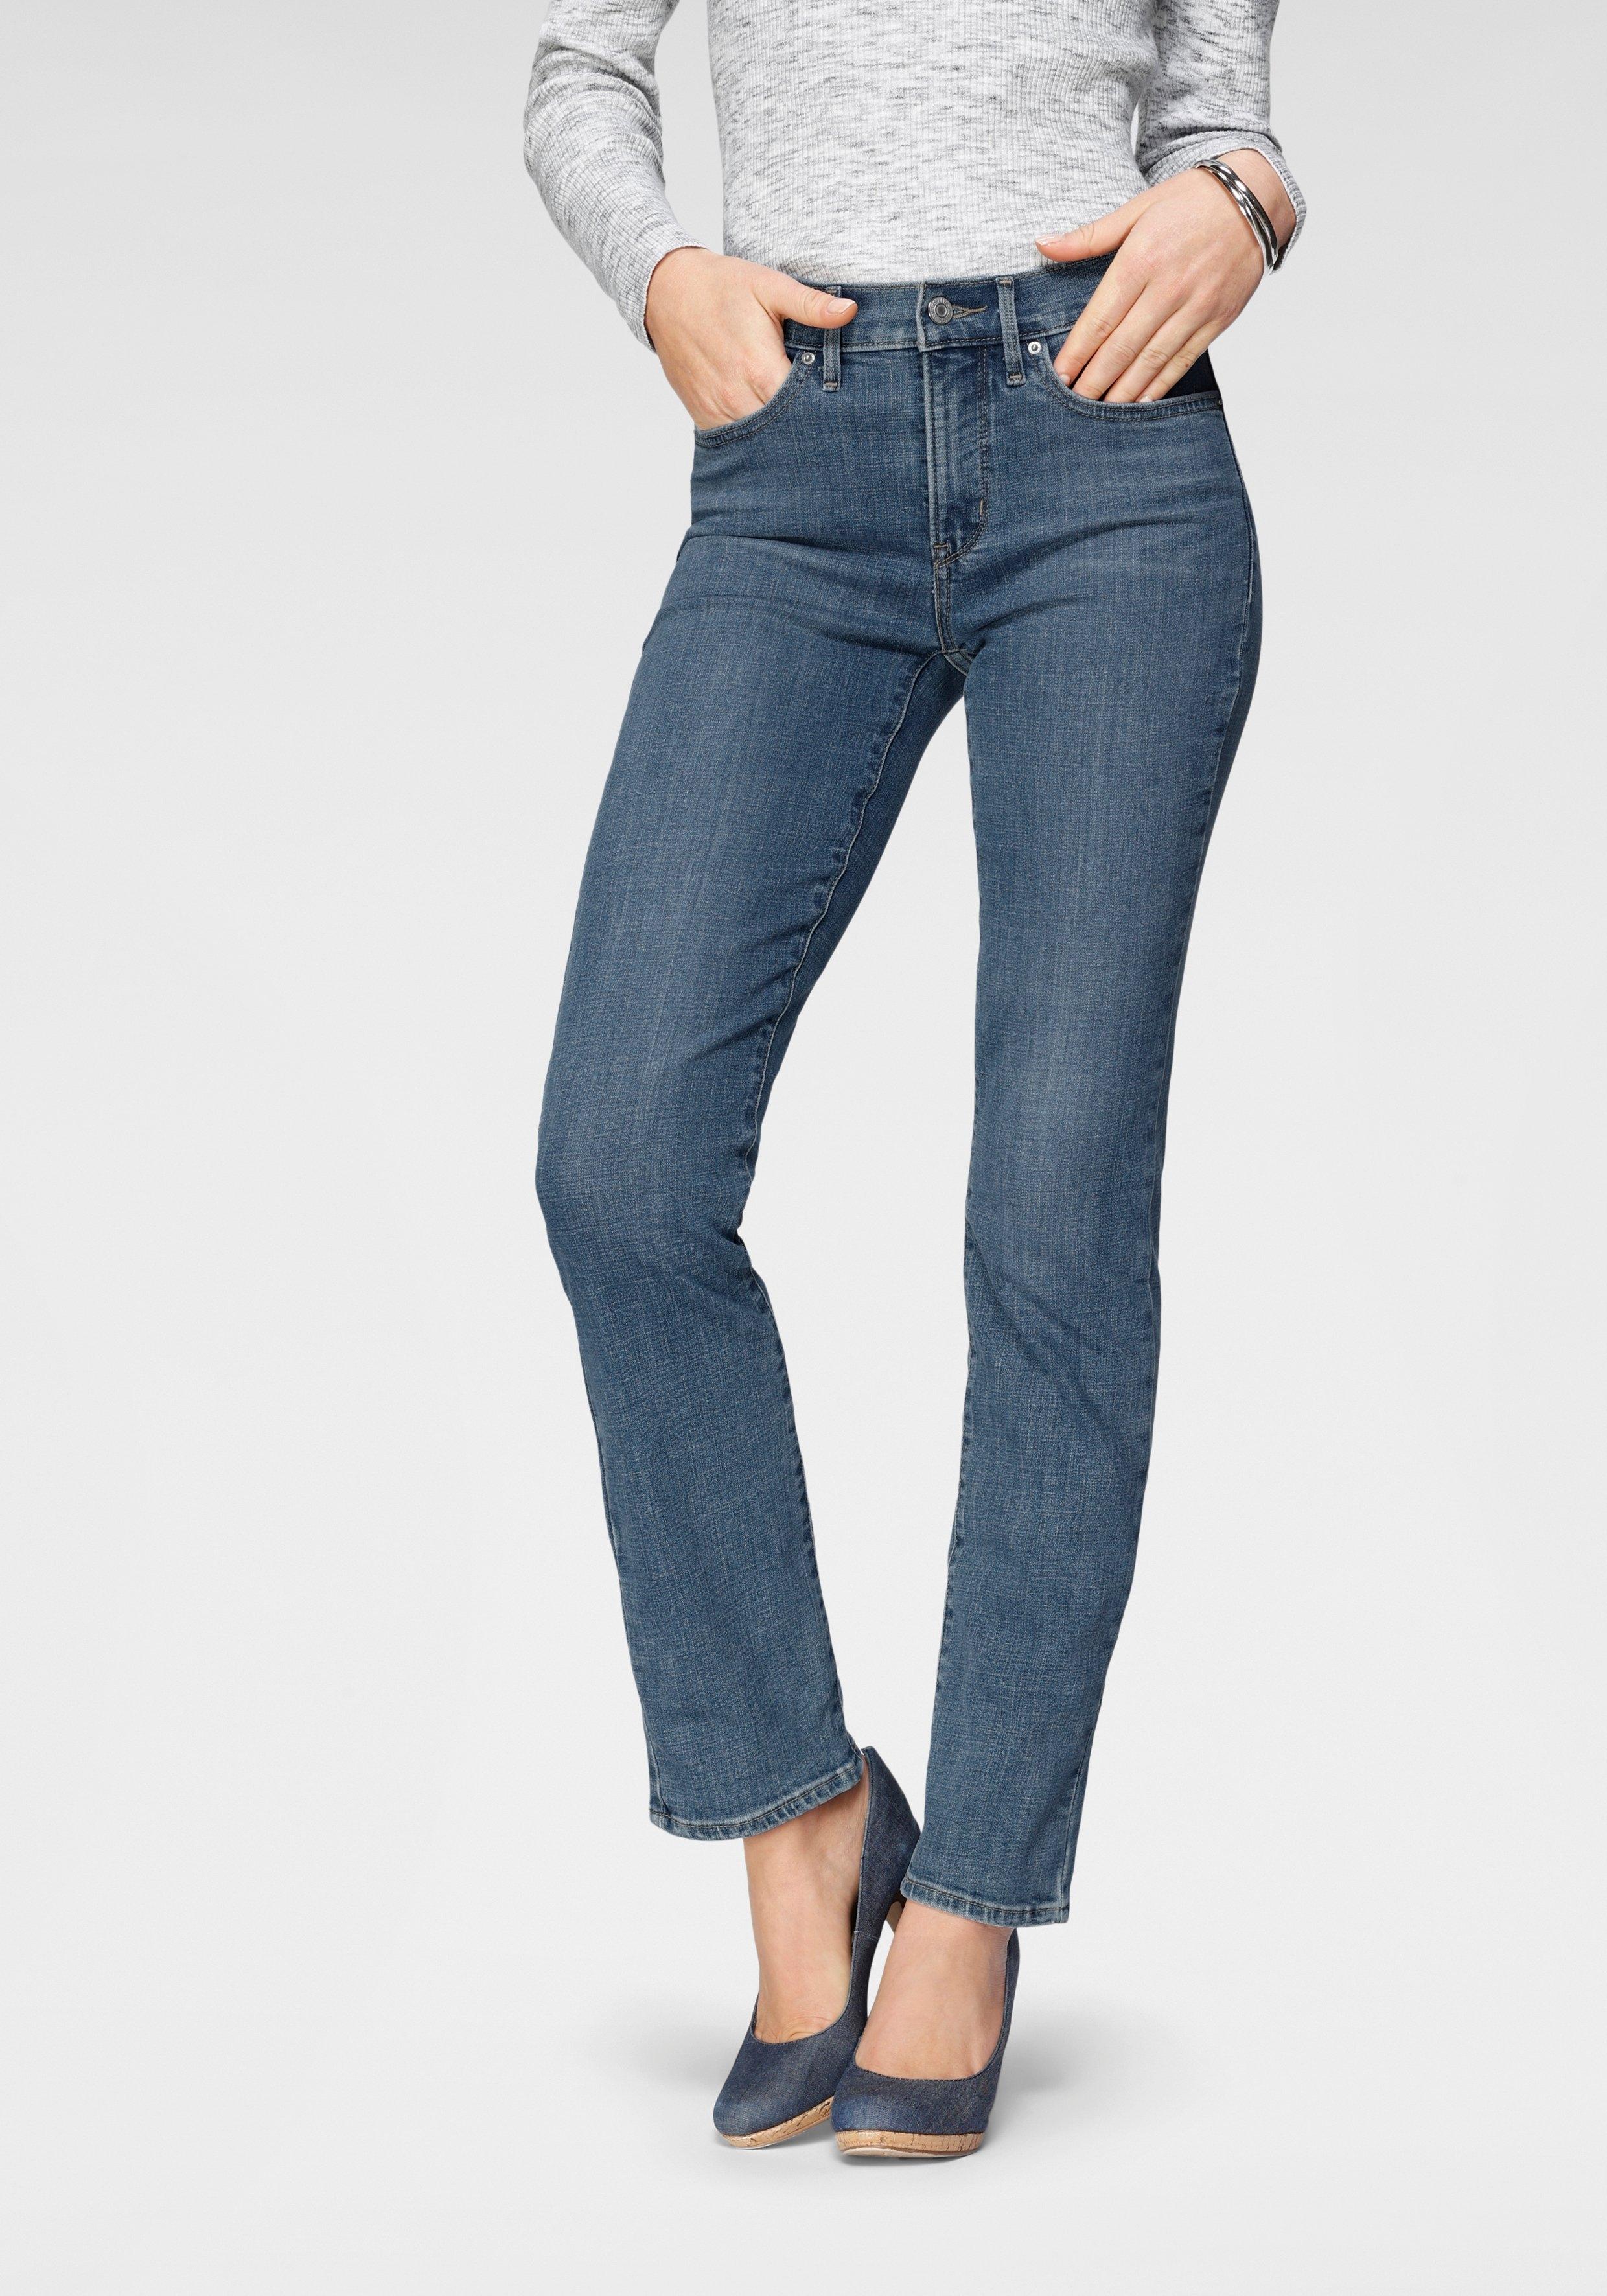 LEVI'S rechte jeans »314 Shaping Straight« goedkoop op otto.nl kopen